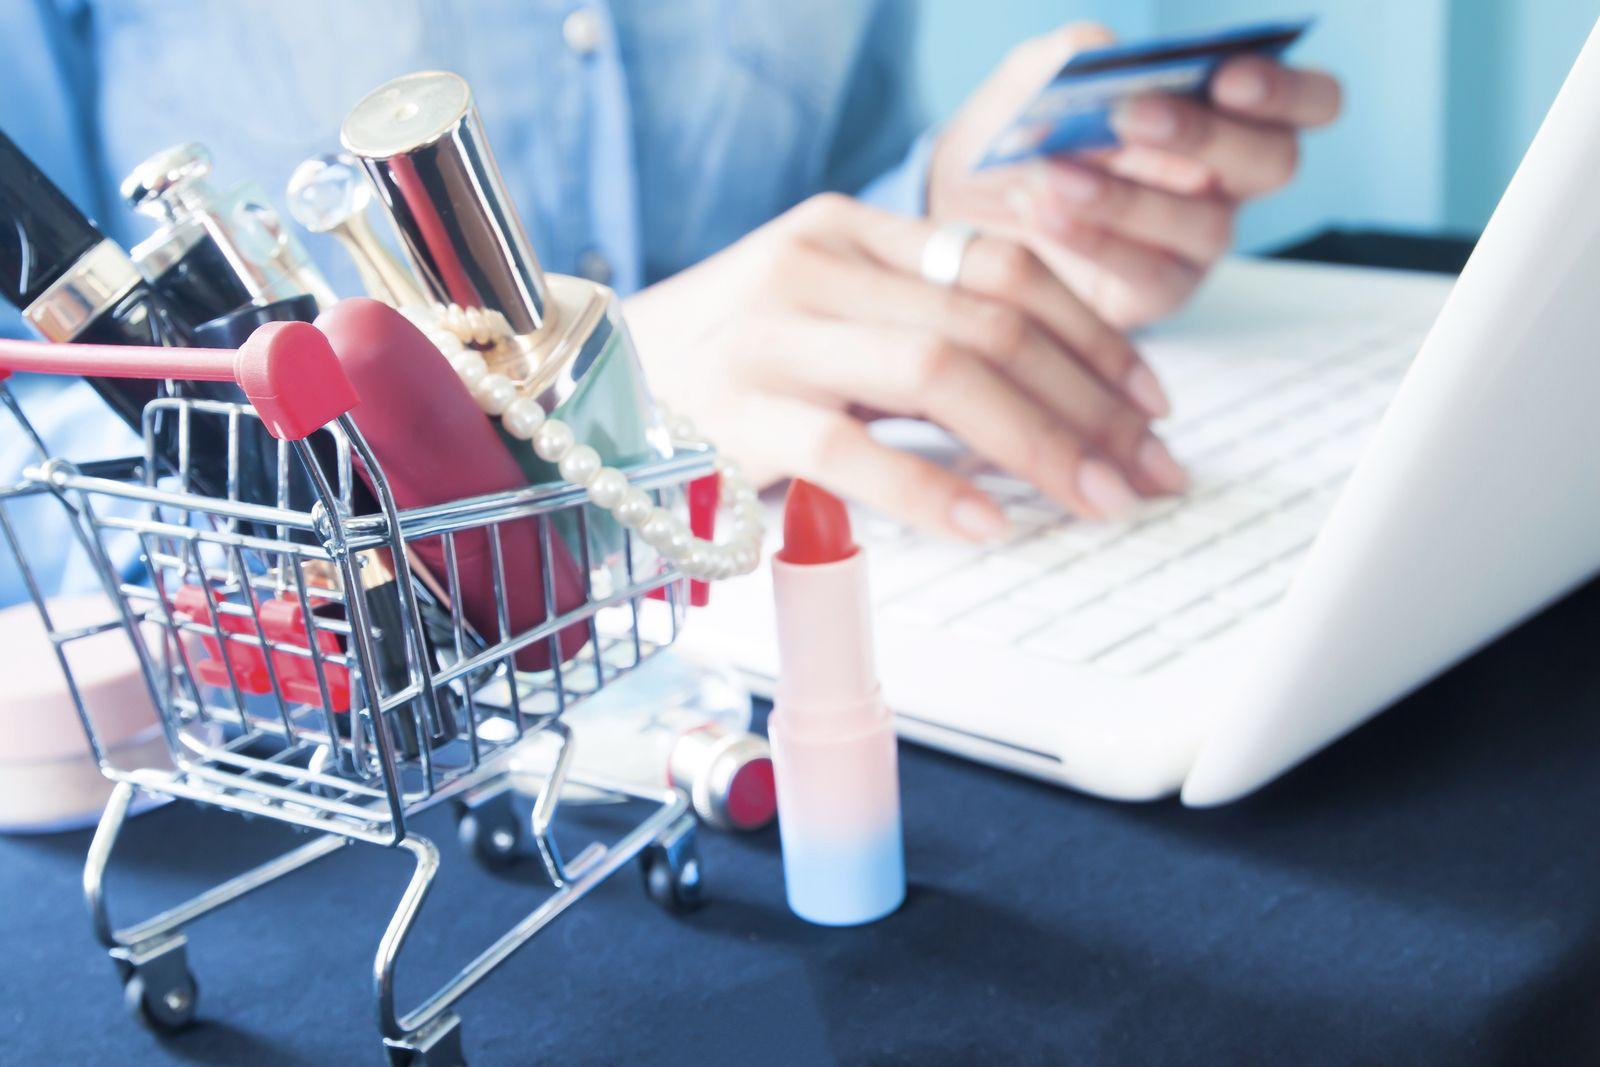 EINMALIGE VERWENDUNG Online Shopping Kosmetik